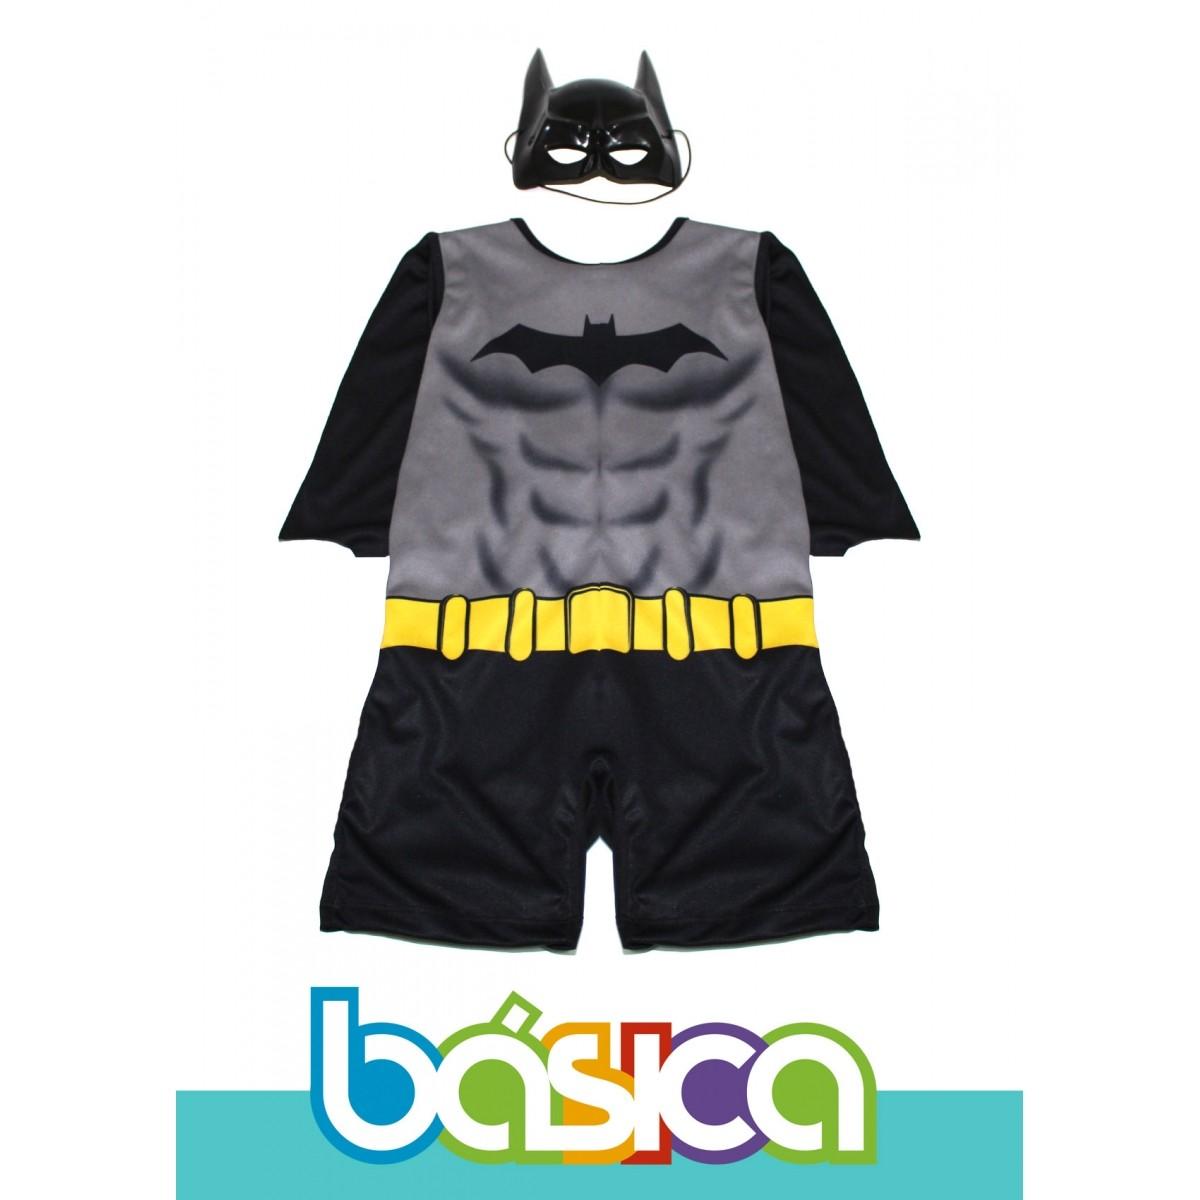 Fantasia do Batman Infantil  - BÁSICA UNIFORMES